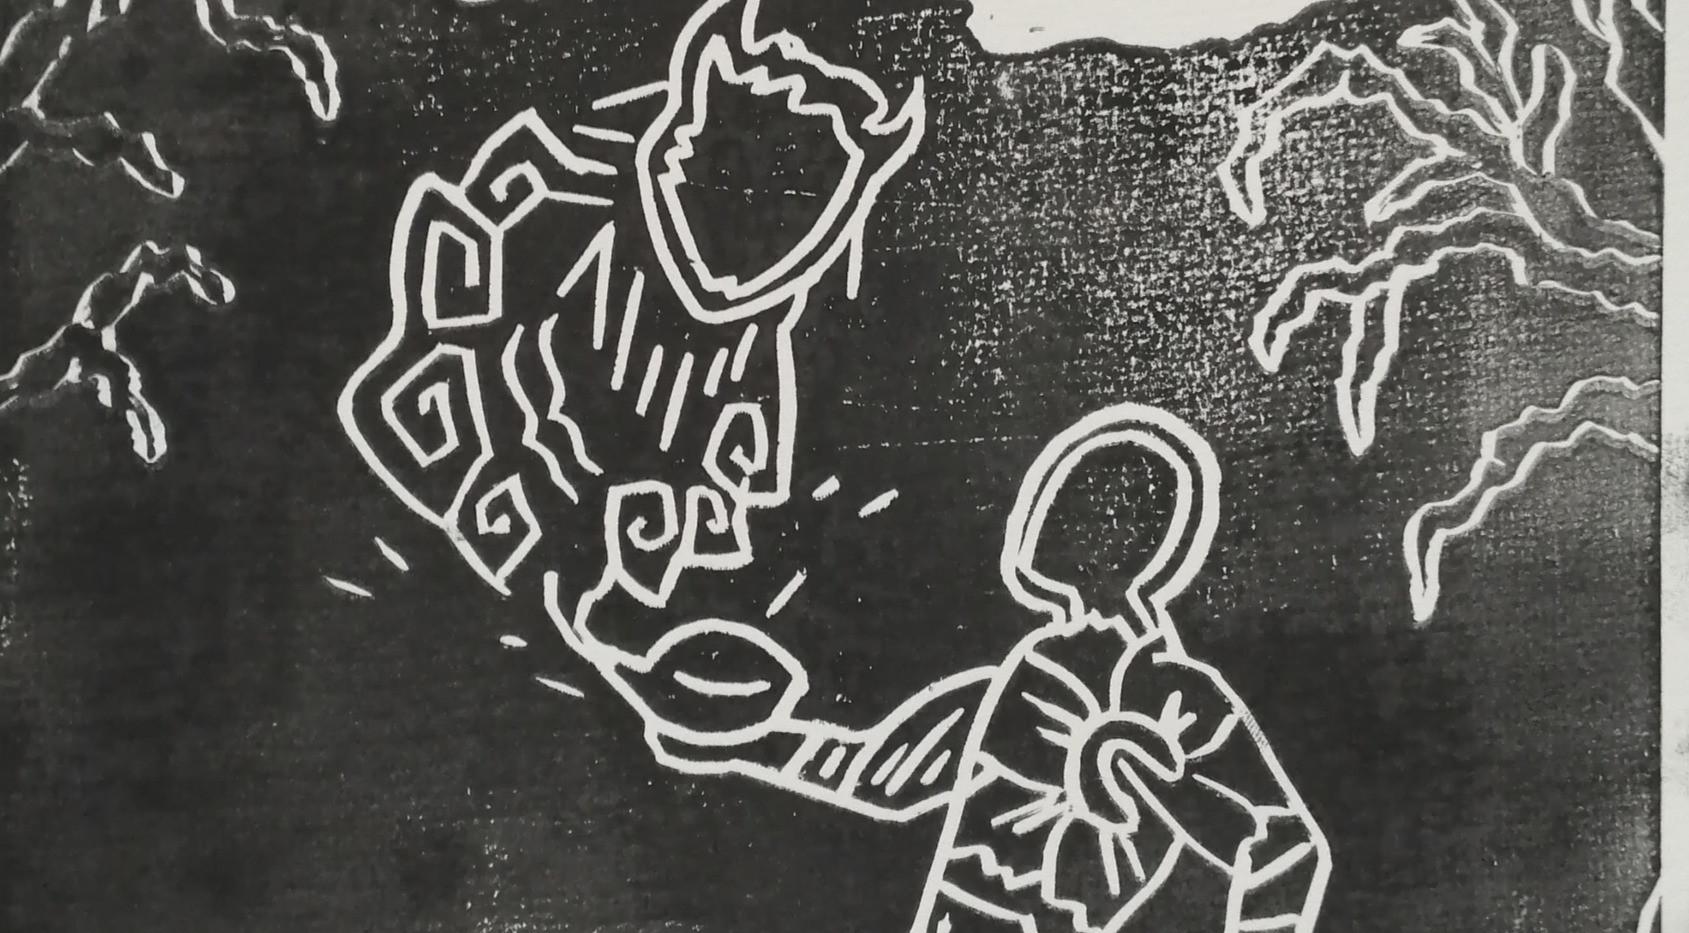 Genie (black/white)